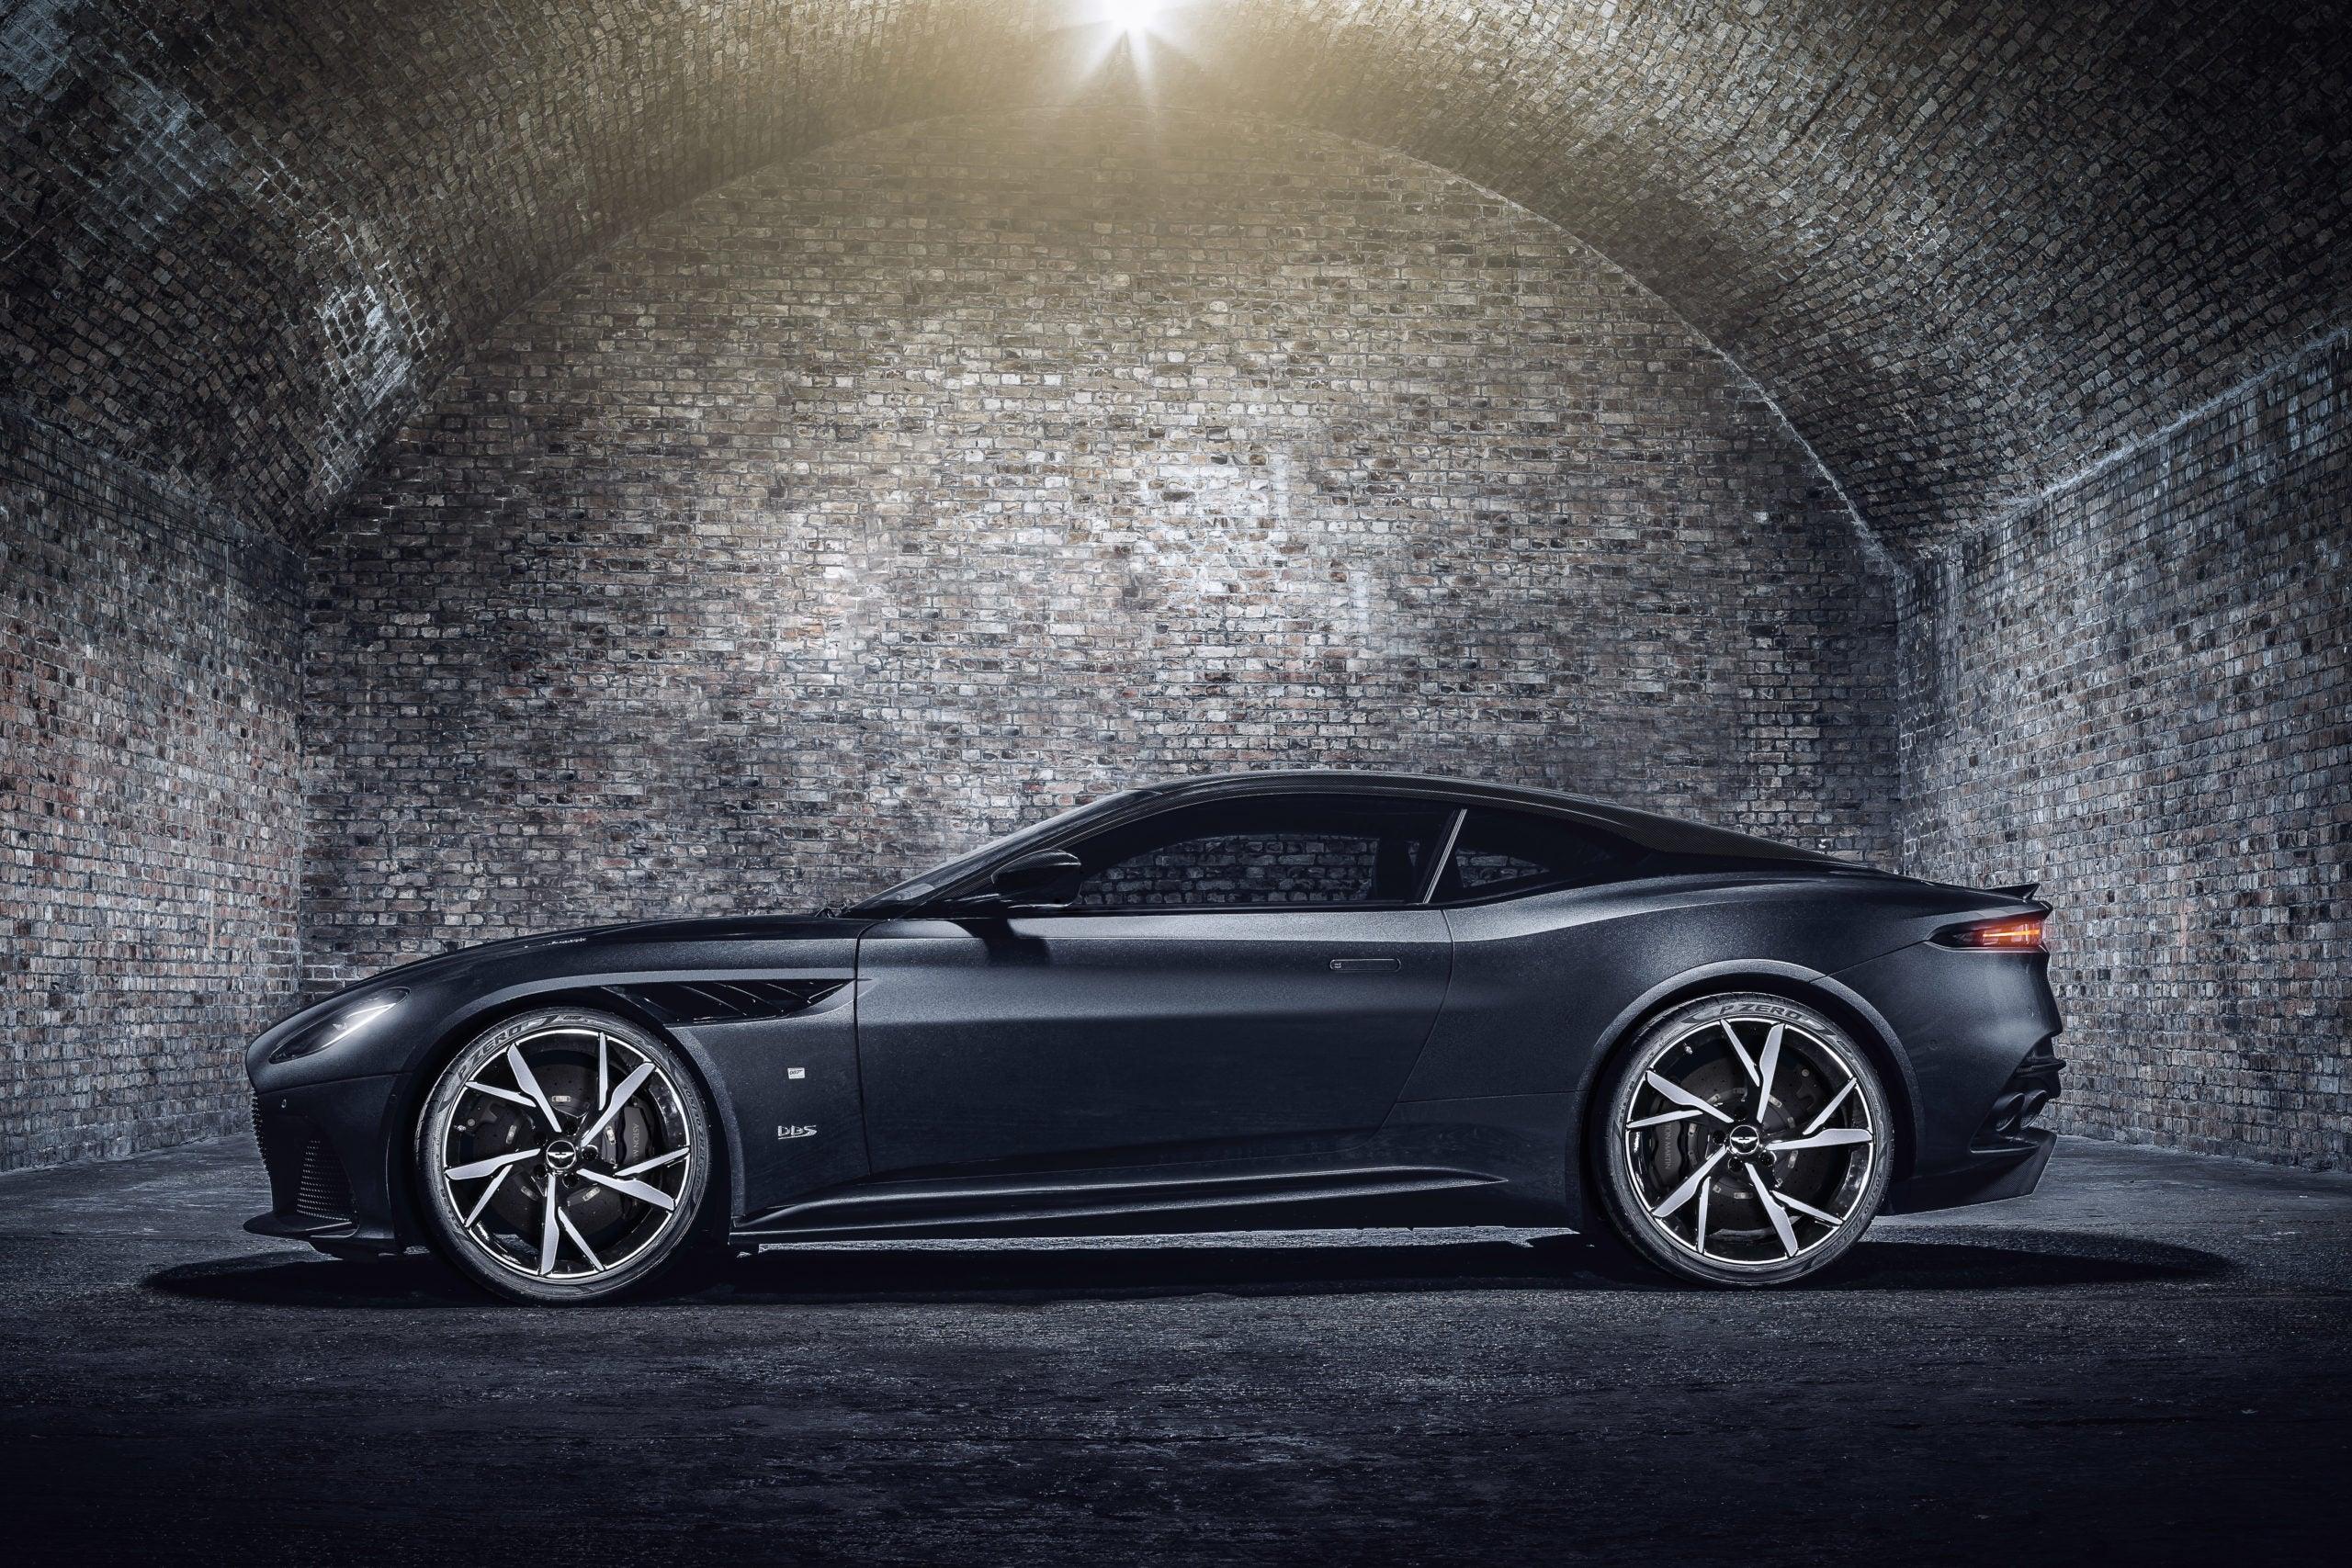 Aston Martin Dbs Superleggera 007 Edition 03 James Bond 007